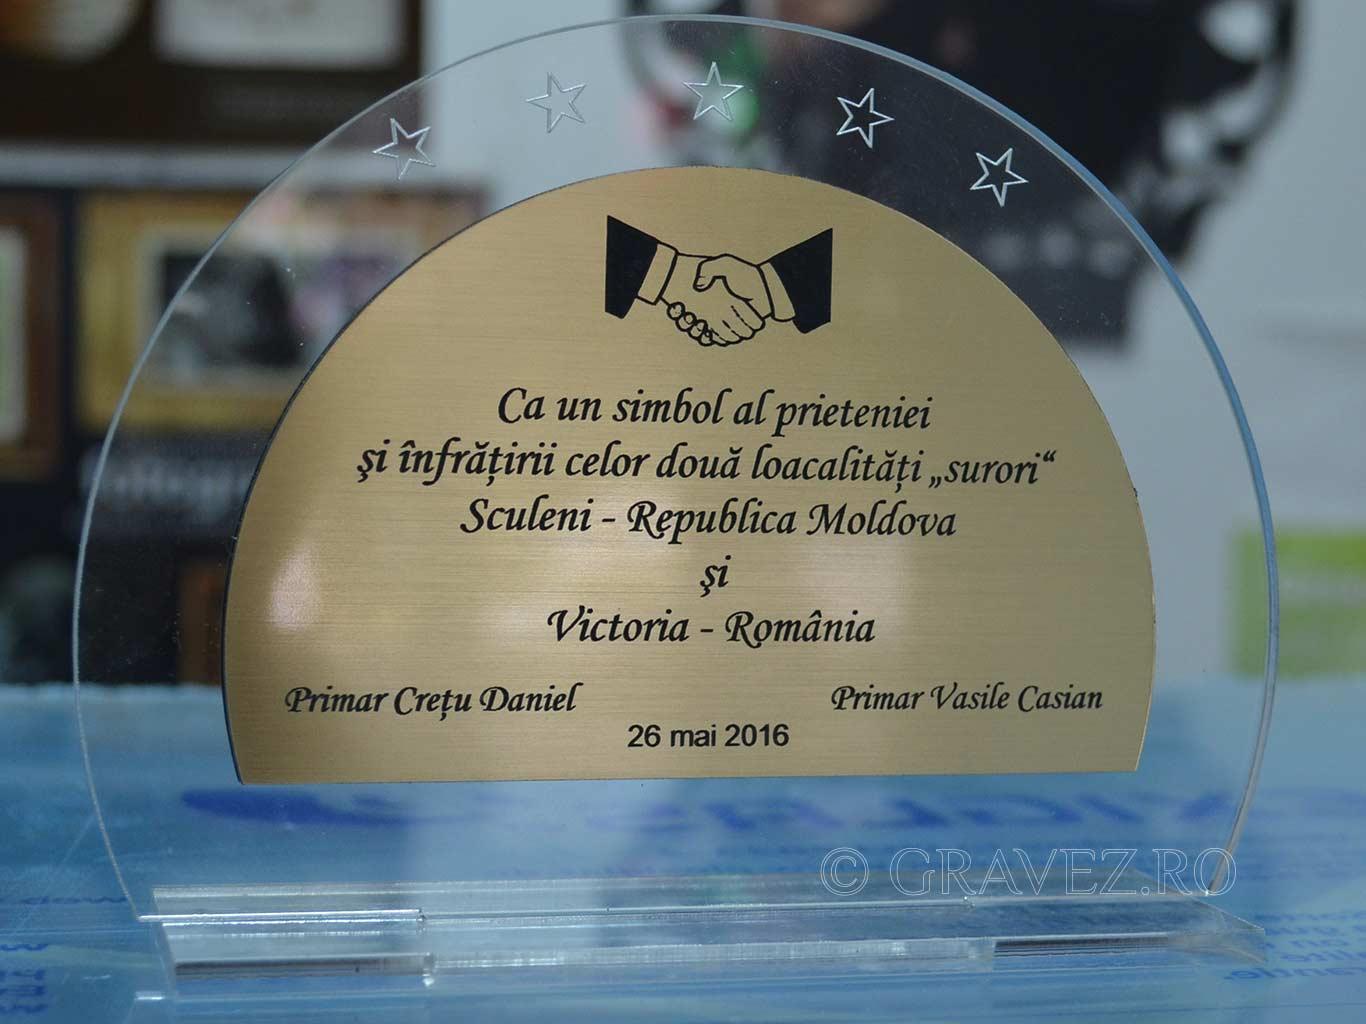 trofe acril metalex pe acril transparent